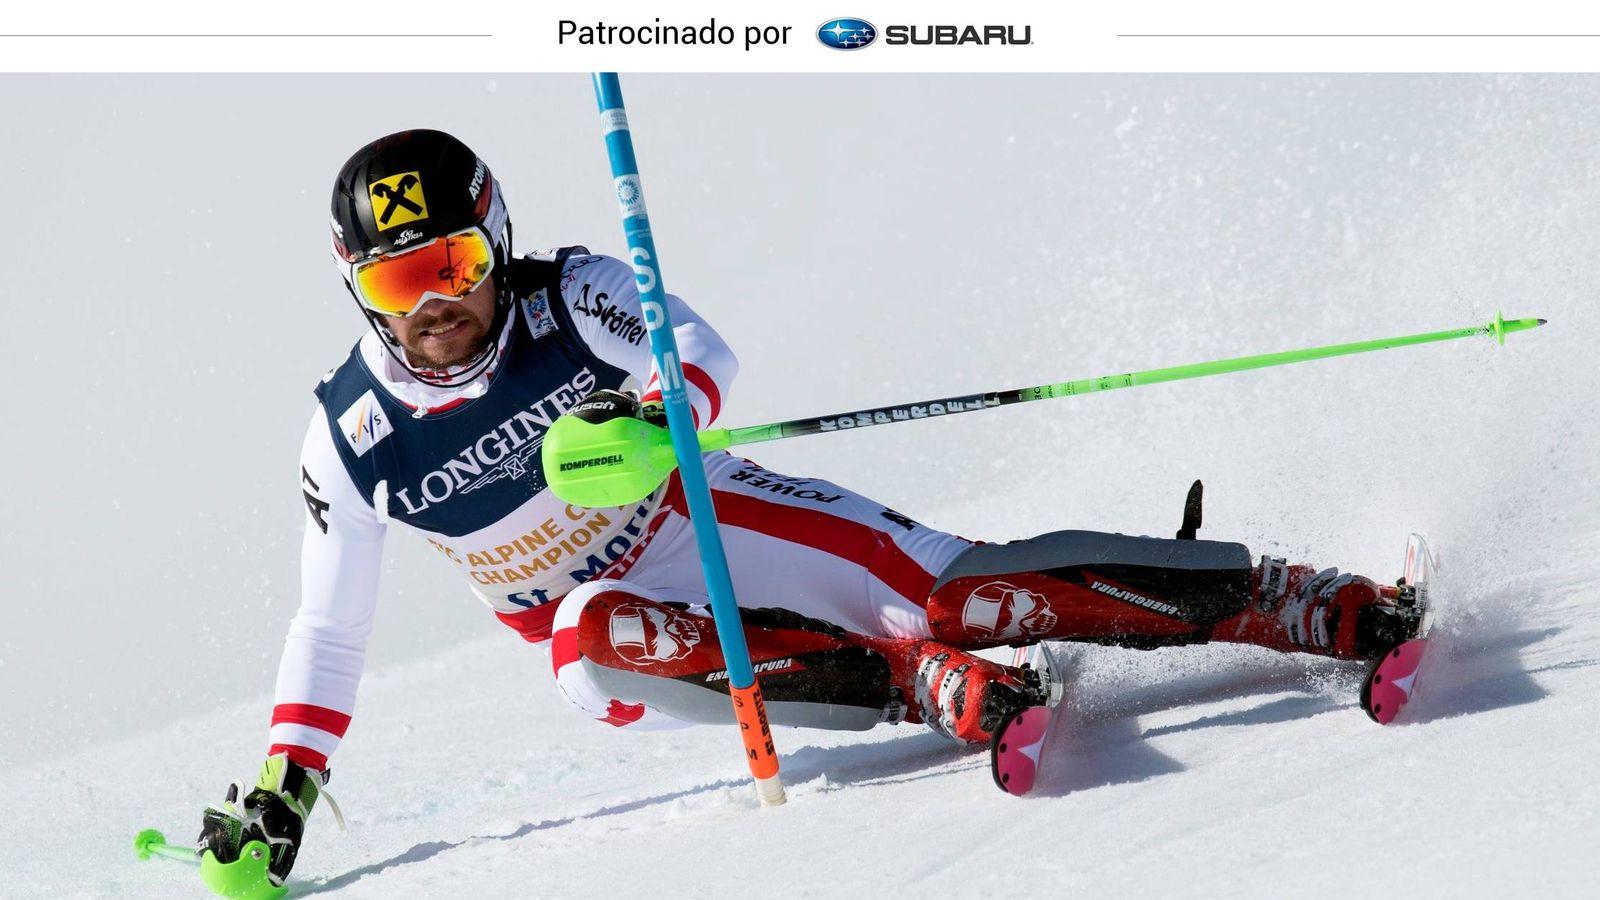 5c1e2a3c29 mucho-ojo-con-las-gafas-de-sol-que-usas-para-esquiar -no-todas-valen.jpg?mtime=1487079889